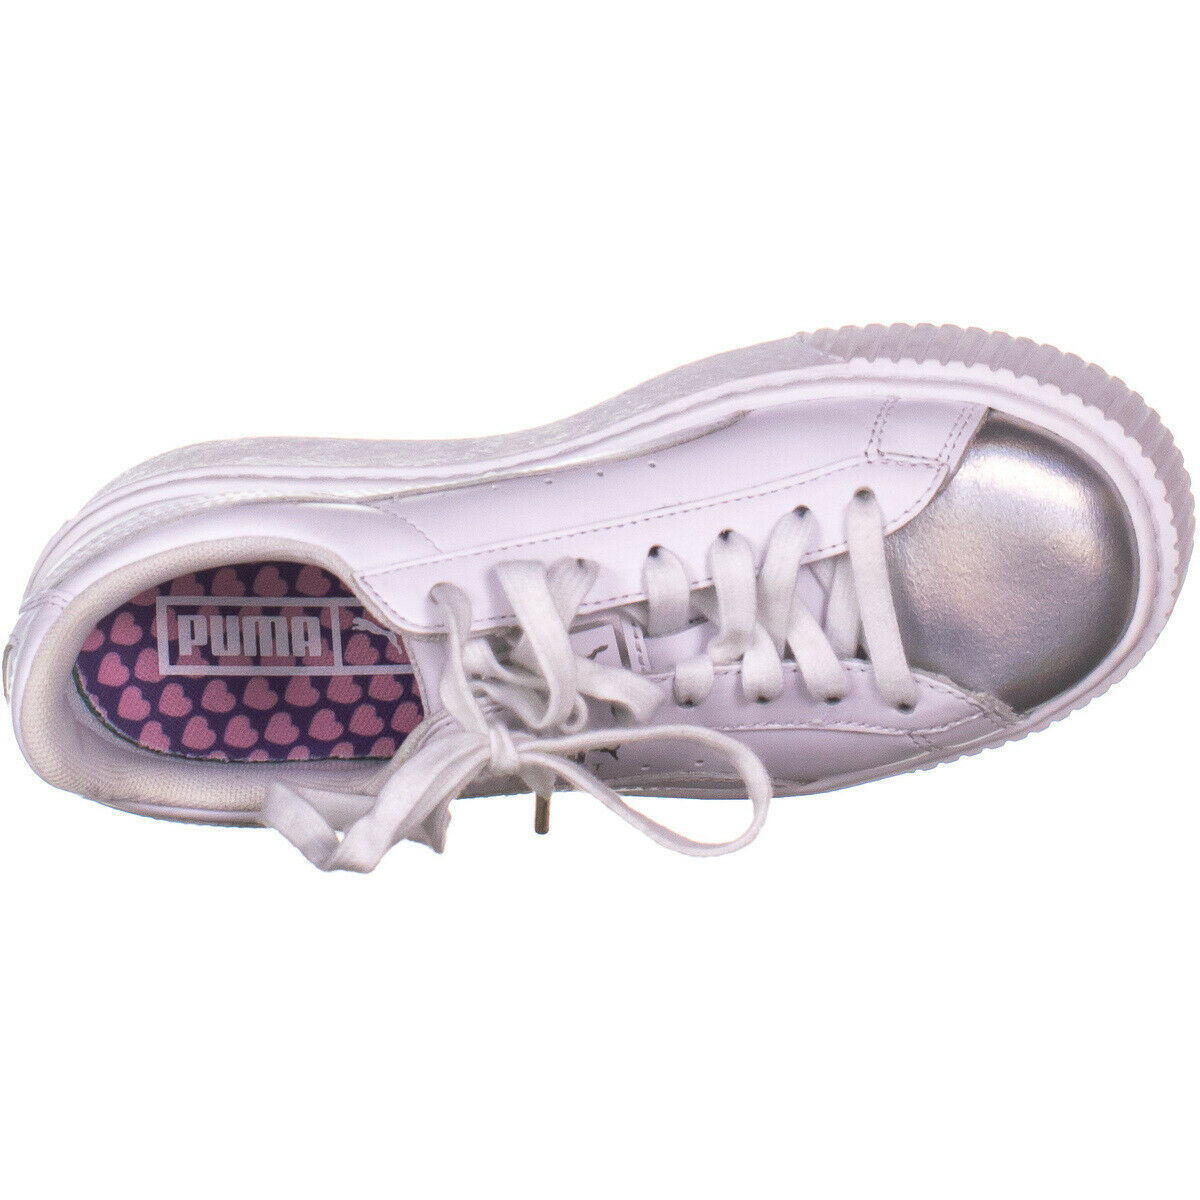 Puma 5896 Lacci Bassa Top, Bianco 877 Bianco, 6 US